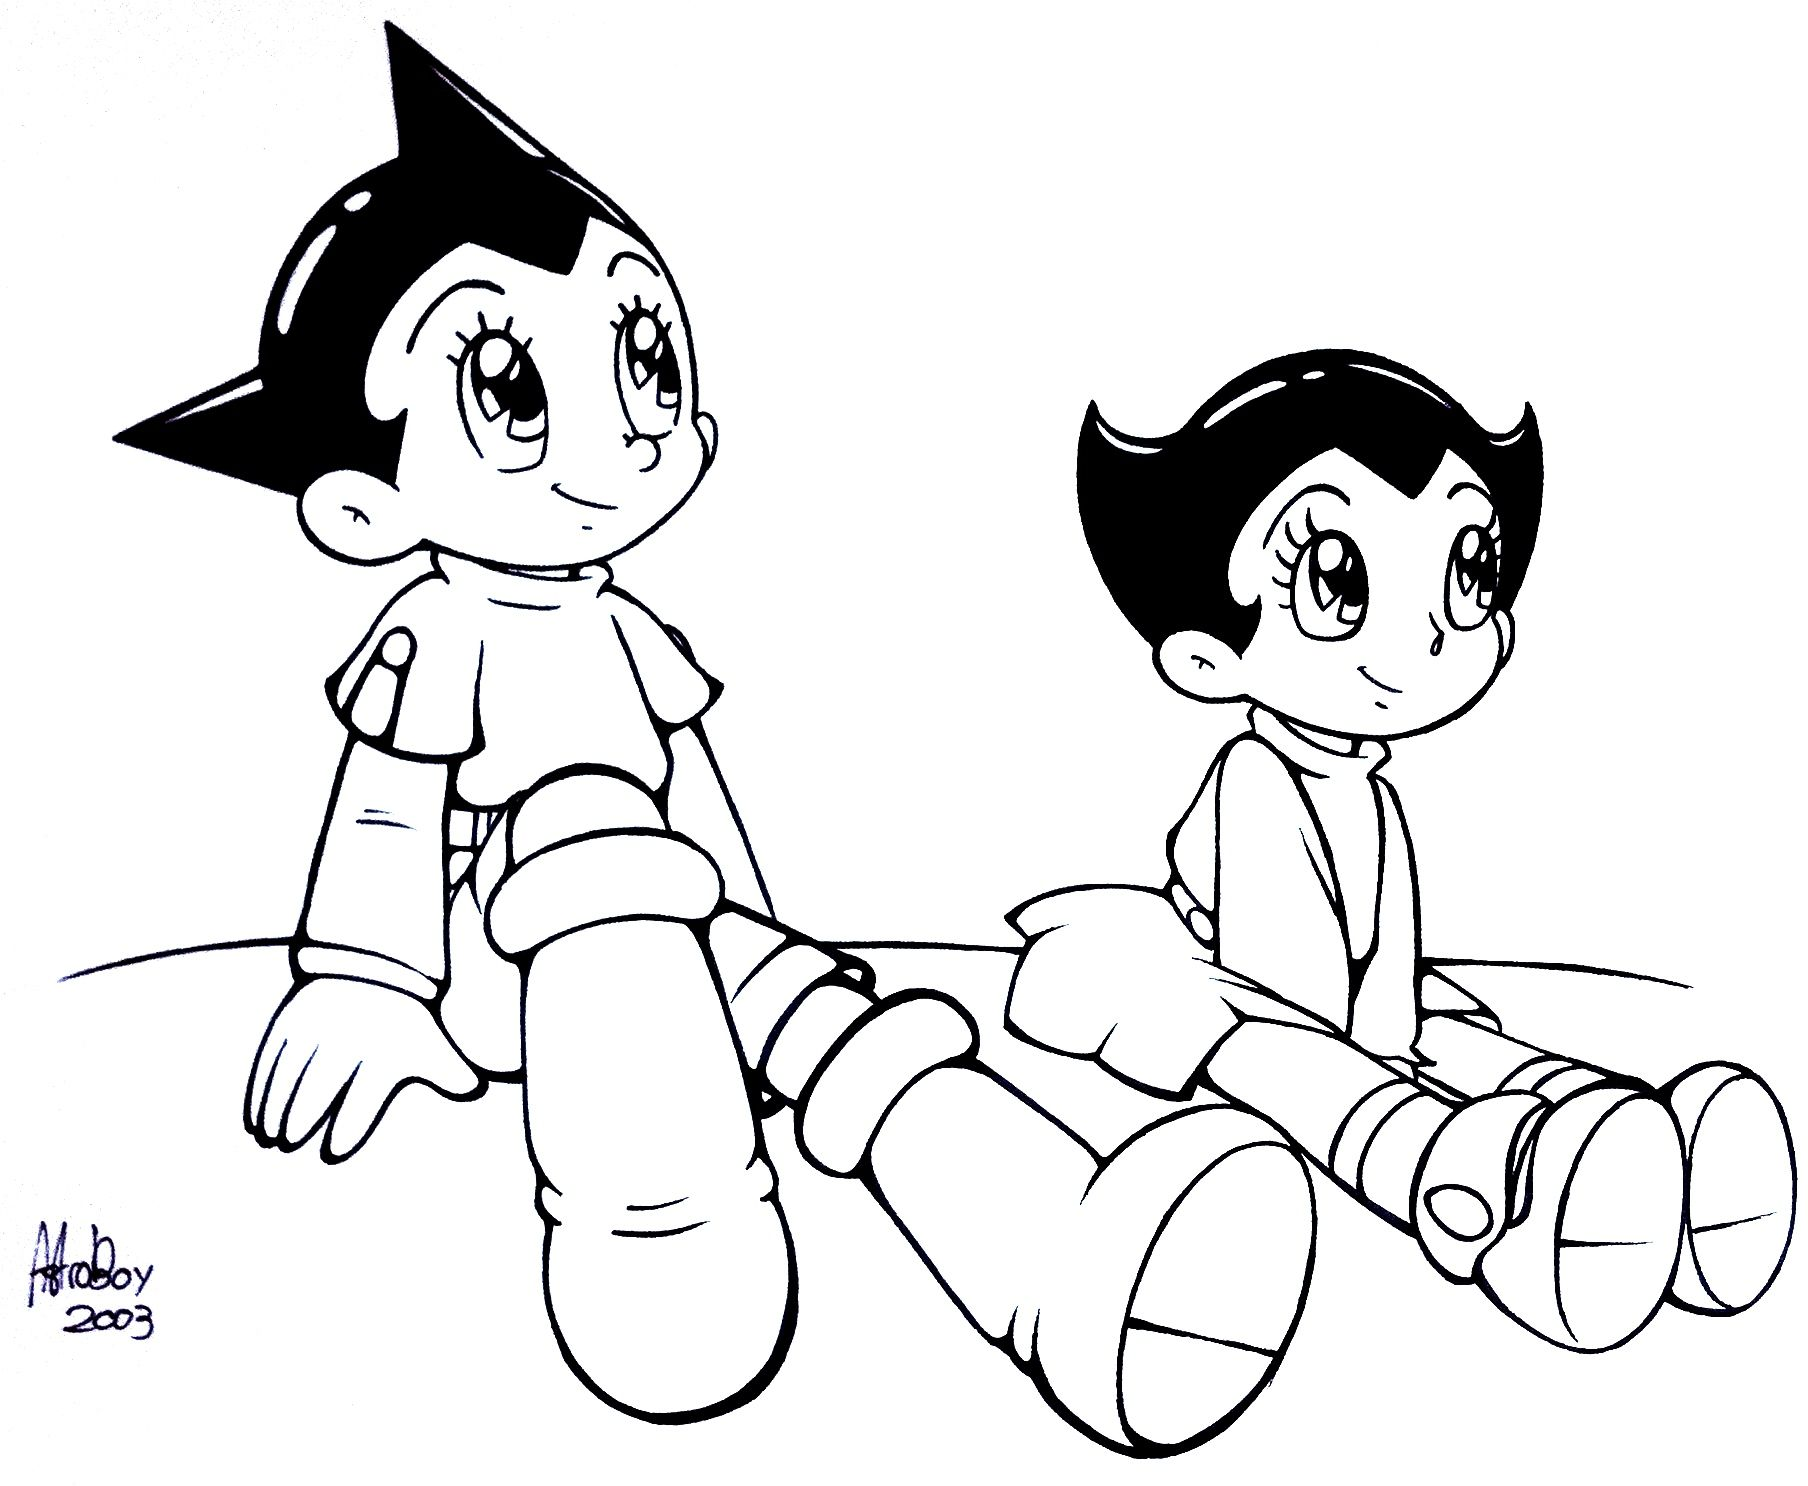 Astro and Zoran by Astro Boy